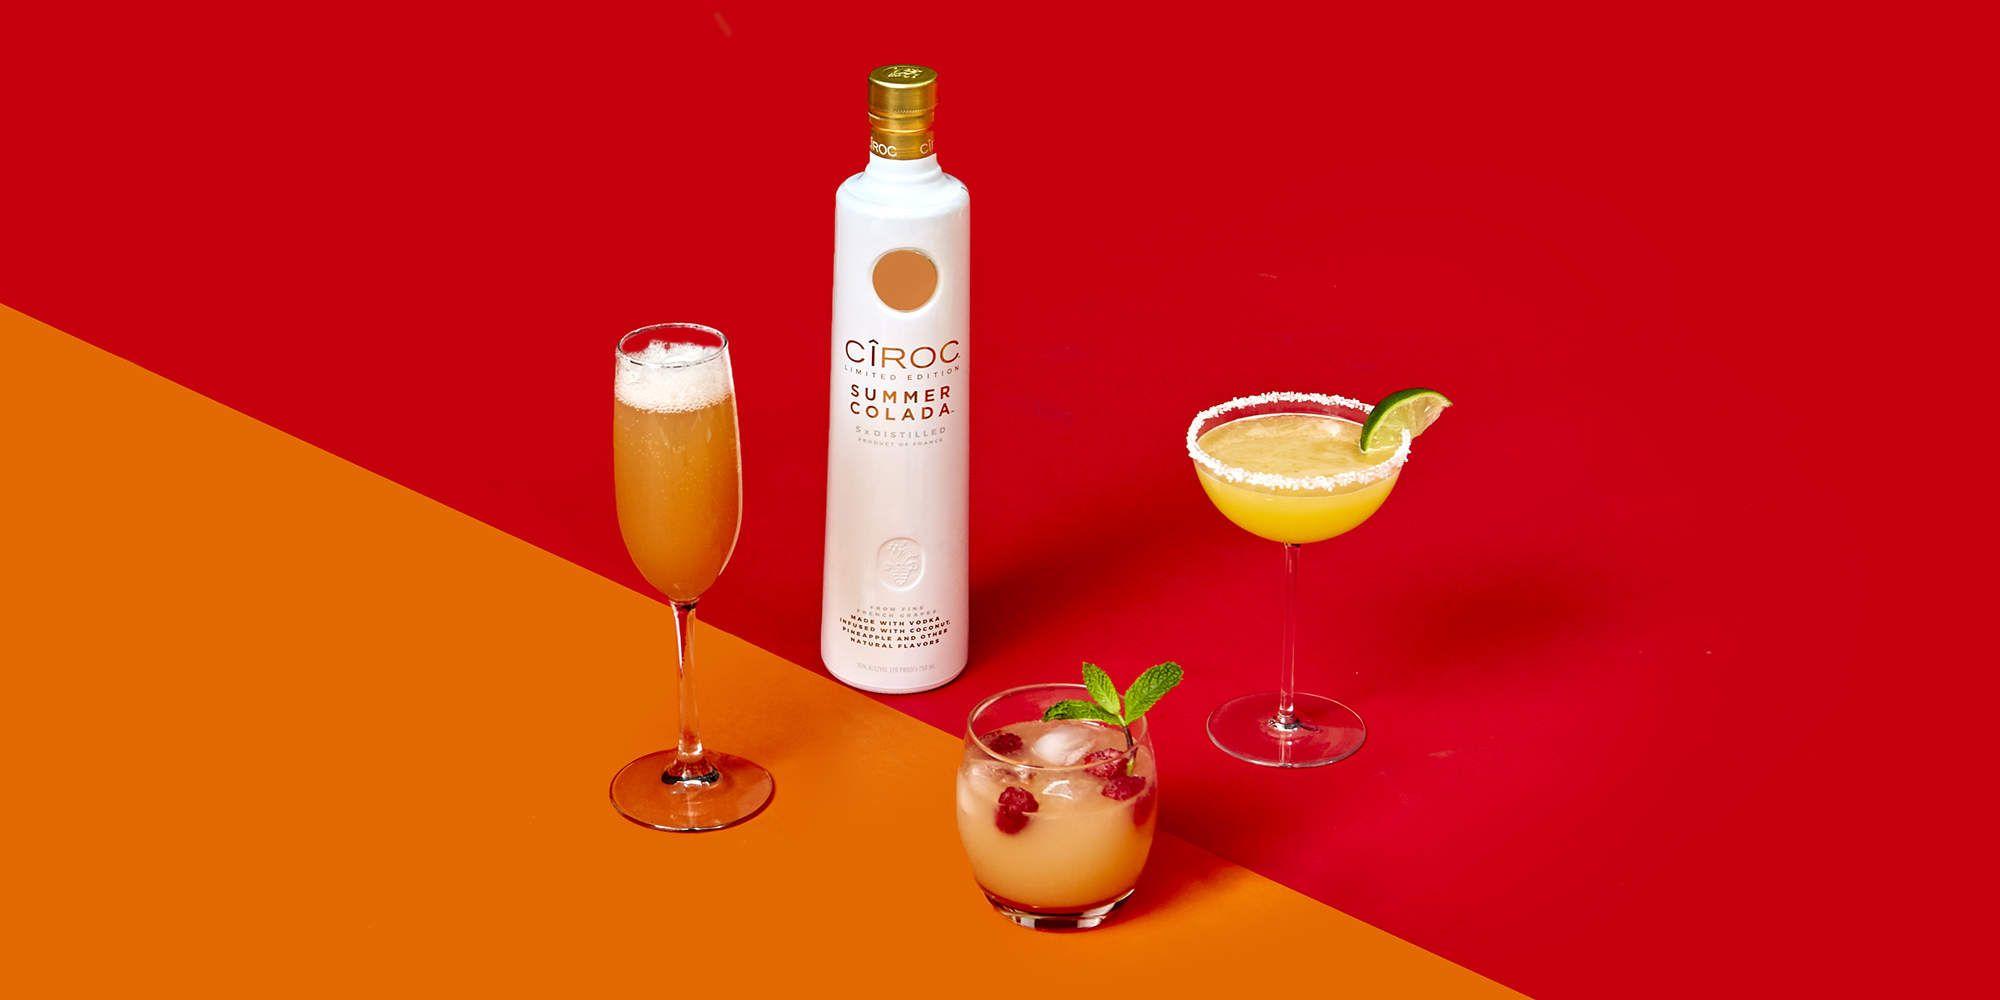 3 Easy Ciroc Summer Colada Recipes Ciroc Summer Colada Ciroc Recipes Colada Drinks